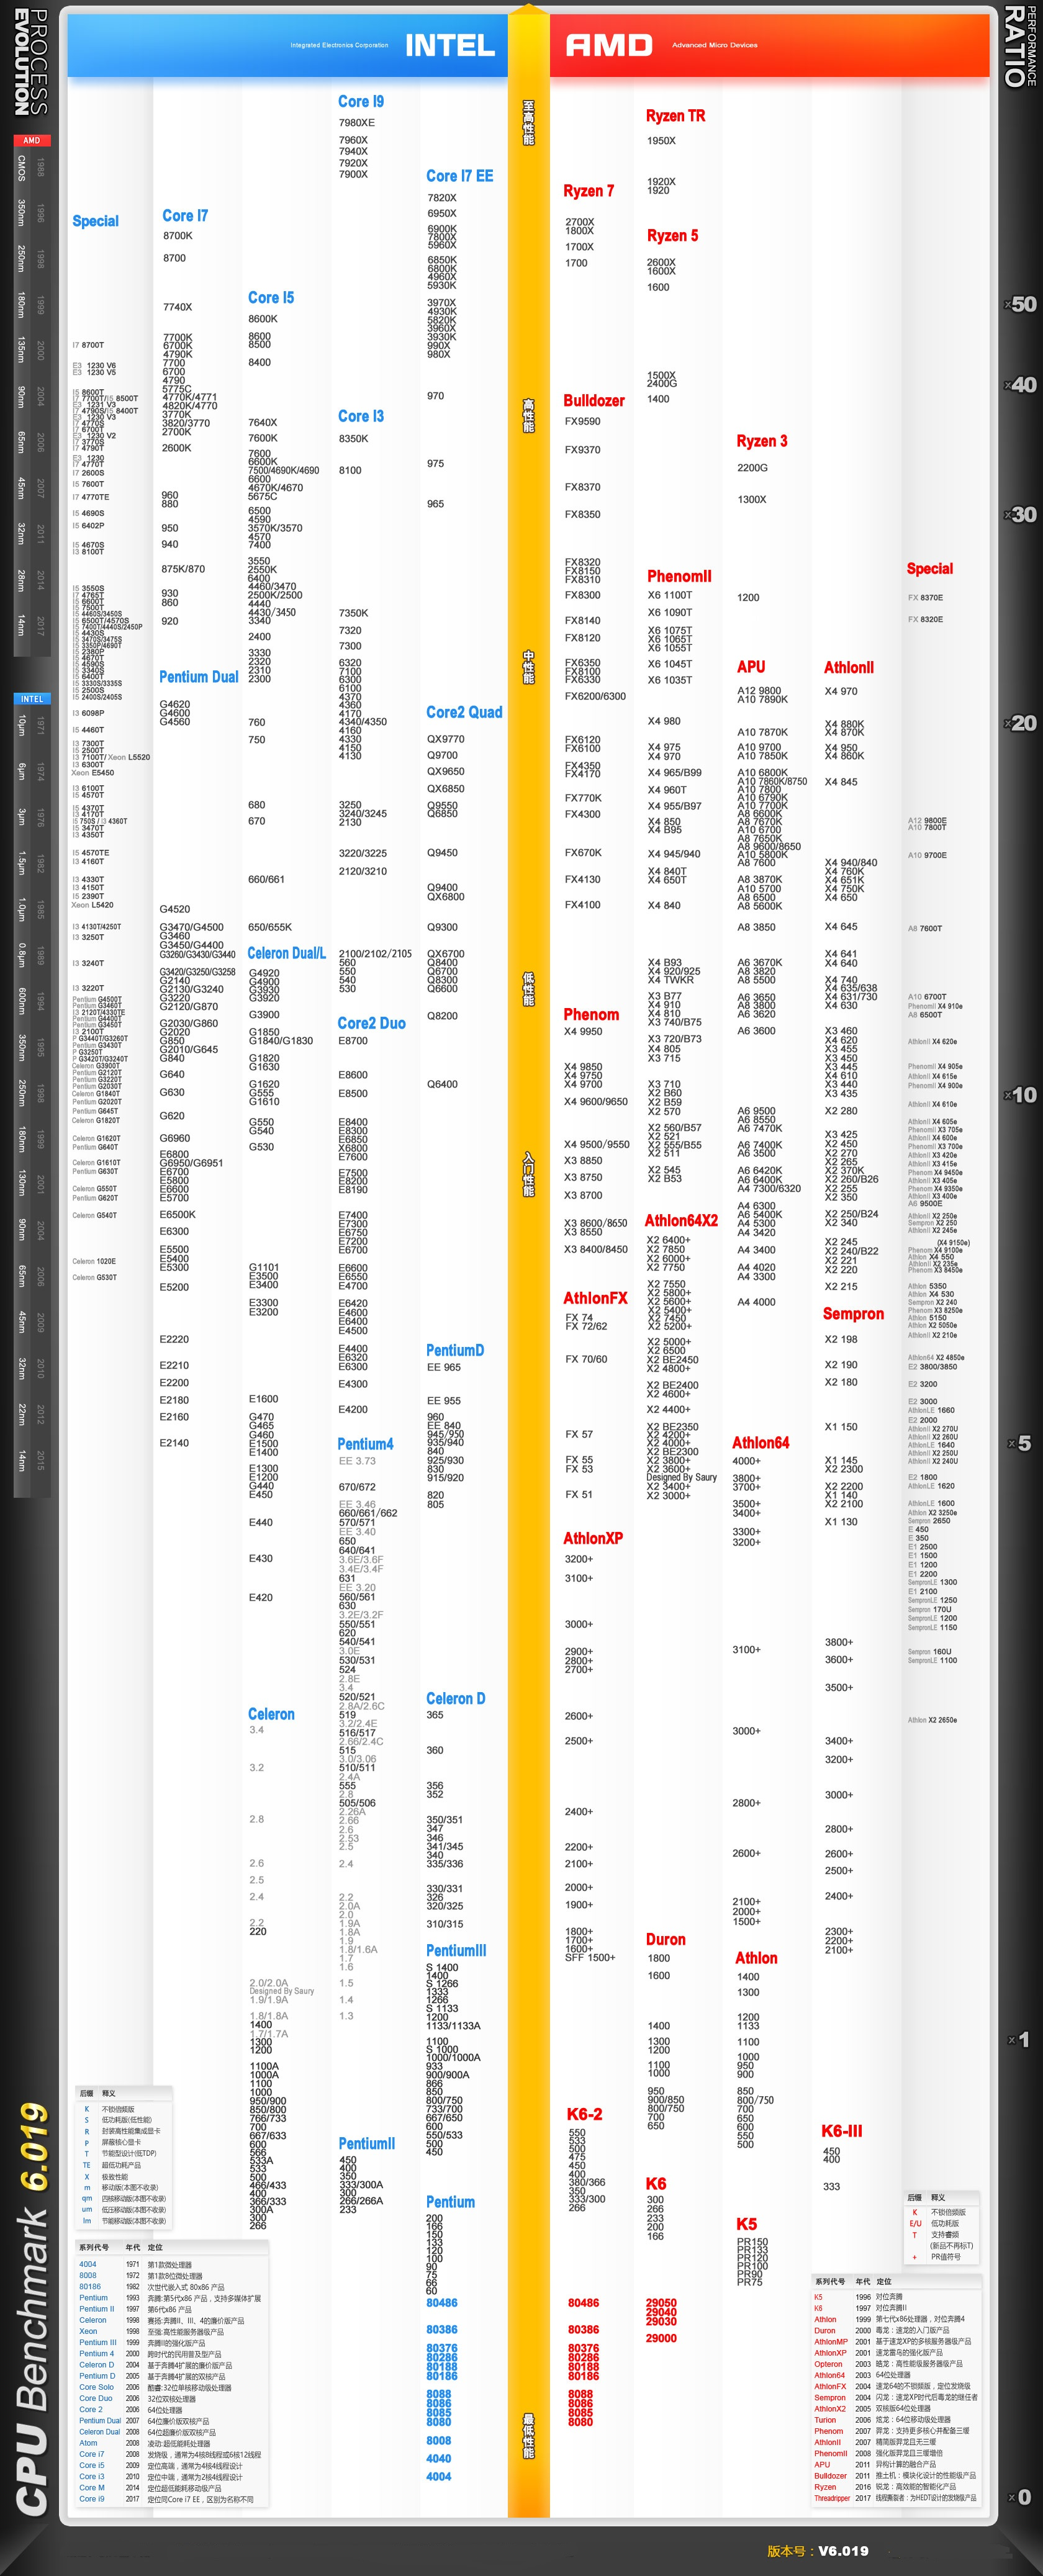 CPU天梯图2018年8月最新版 八月<a href=/tags-台式电脑-0.html target=_blank class=infotextkey>台式电脑</a>CPU性能排行